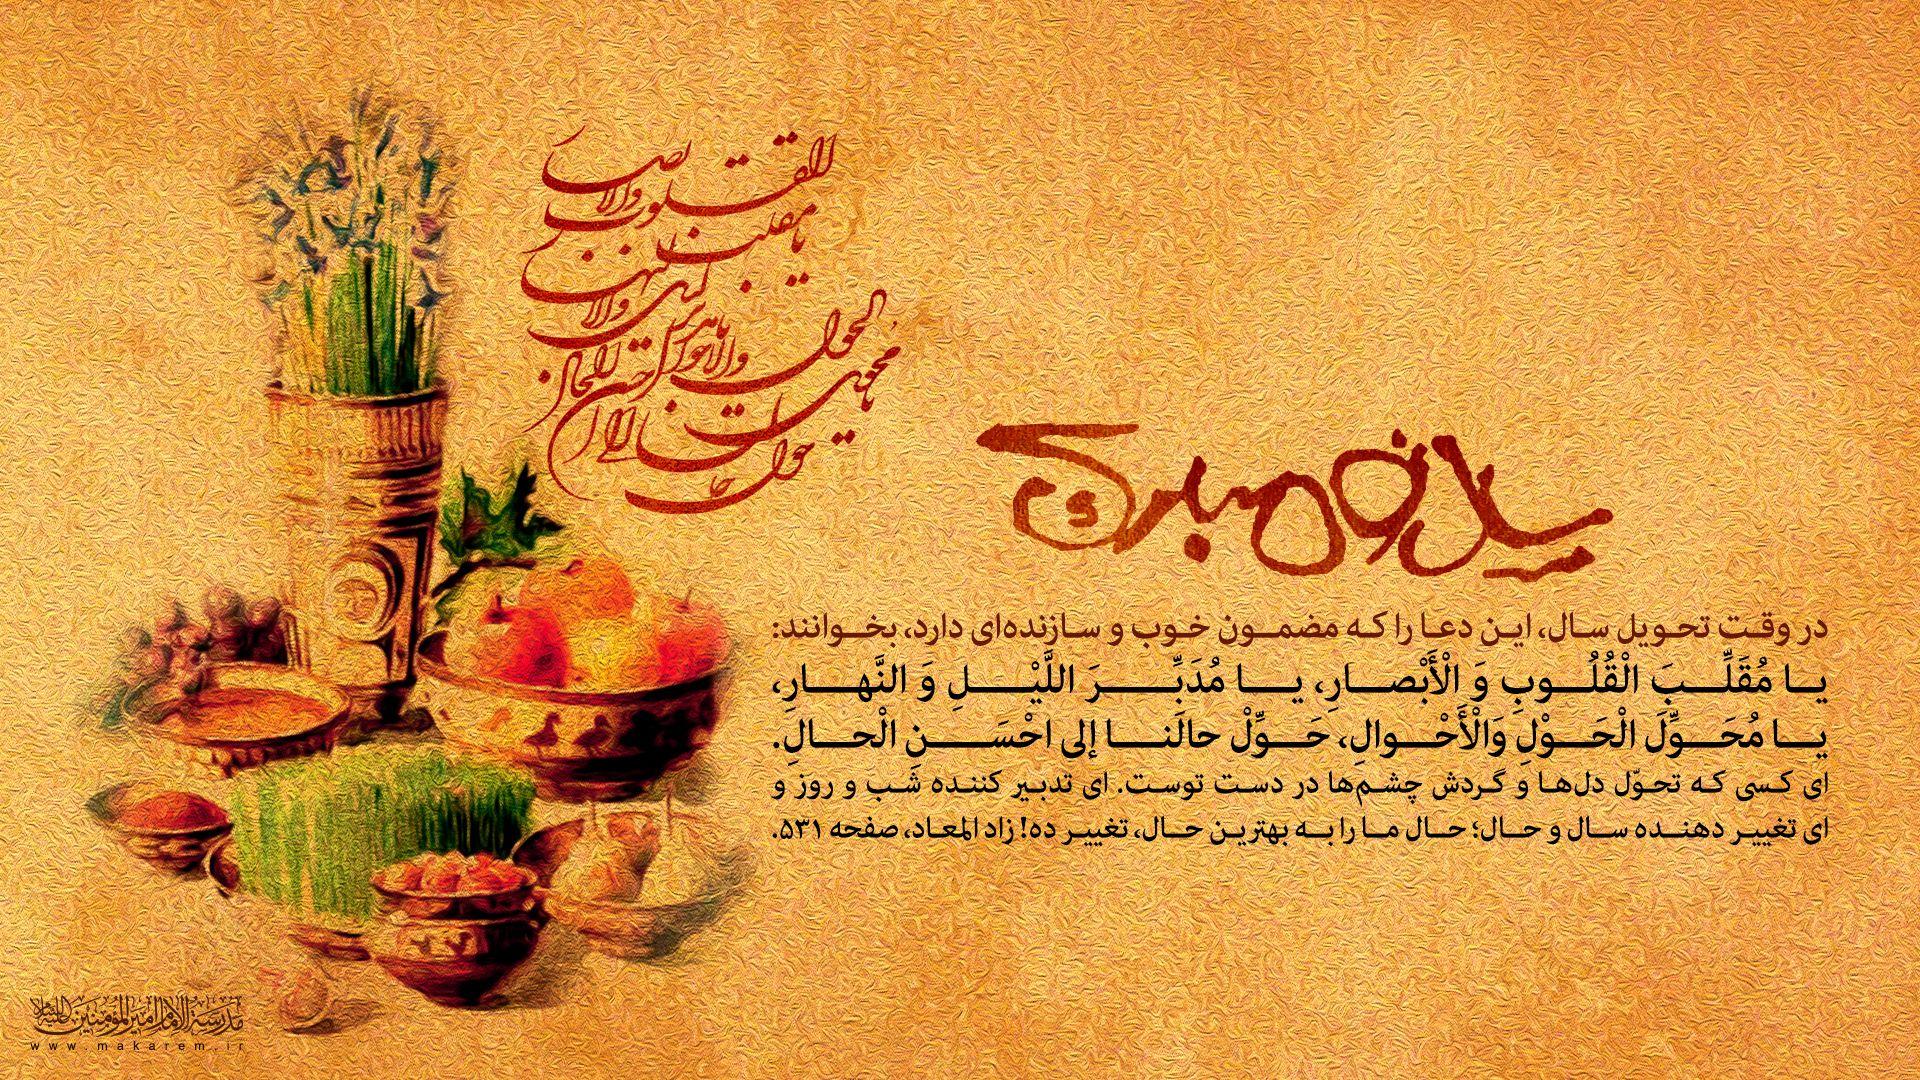 نوروز 01-مدرسه الامام امیر المومنین (ع)